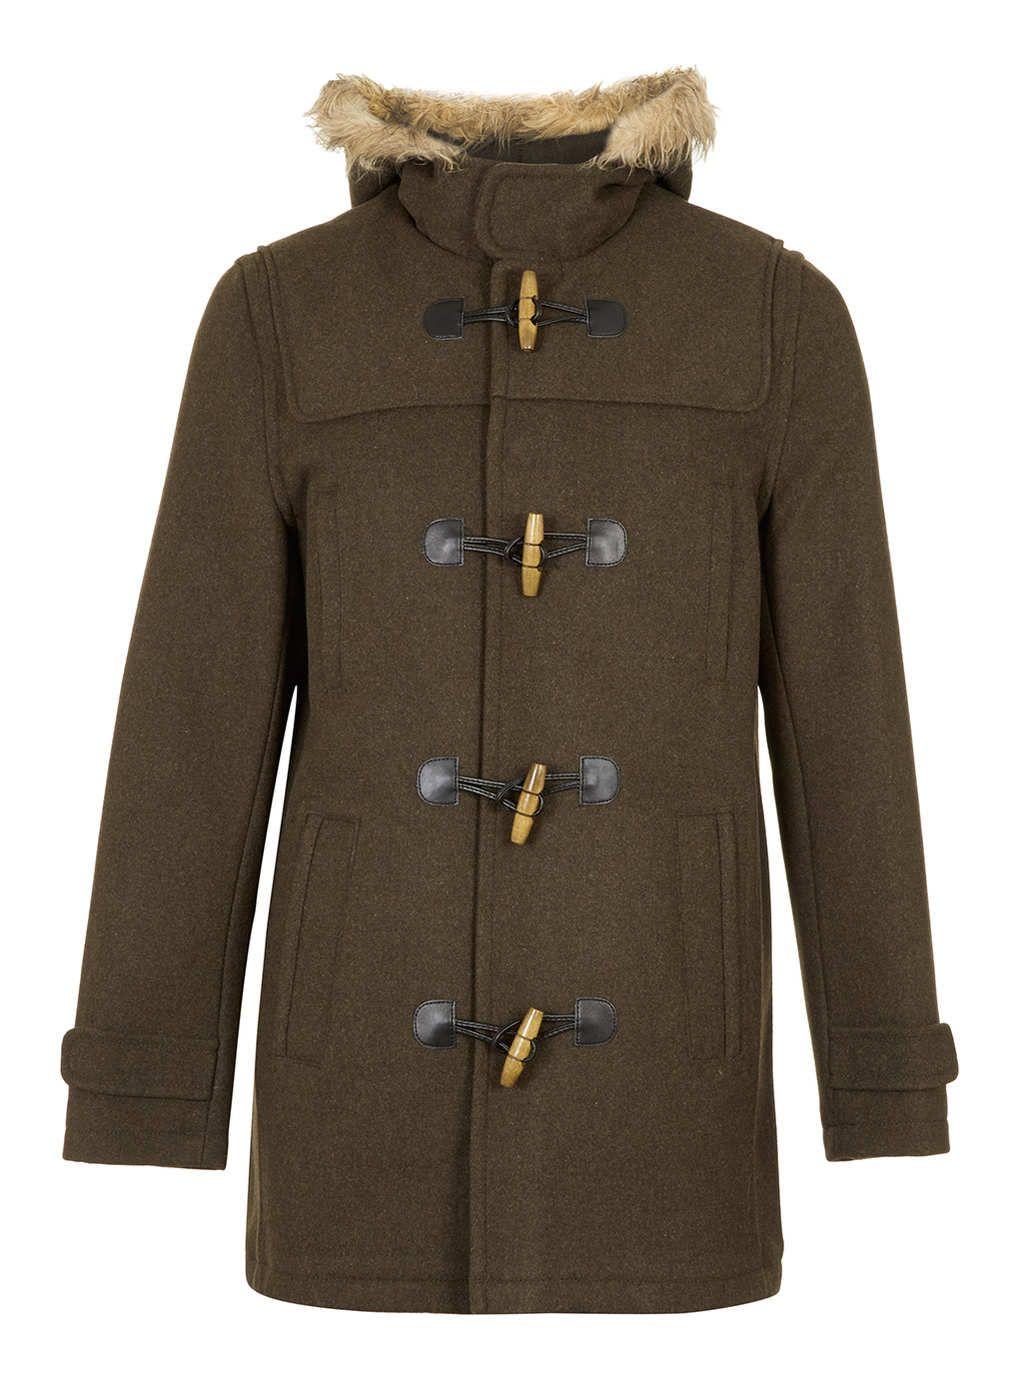 KHAKI WOOL DUFFLE COAT - Men's Jackets & Coats - Clothing - TOPMAN ...